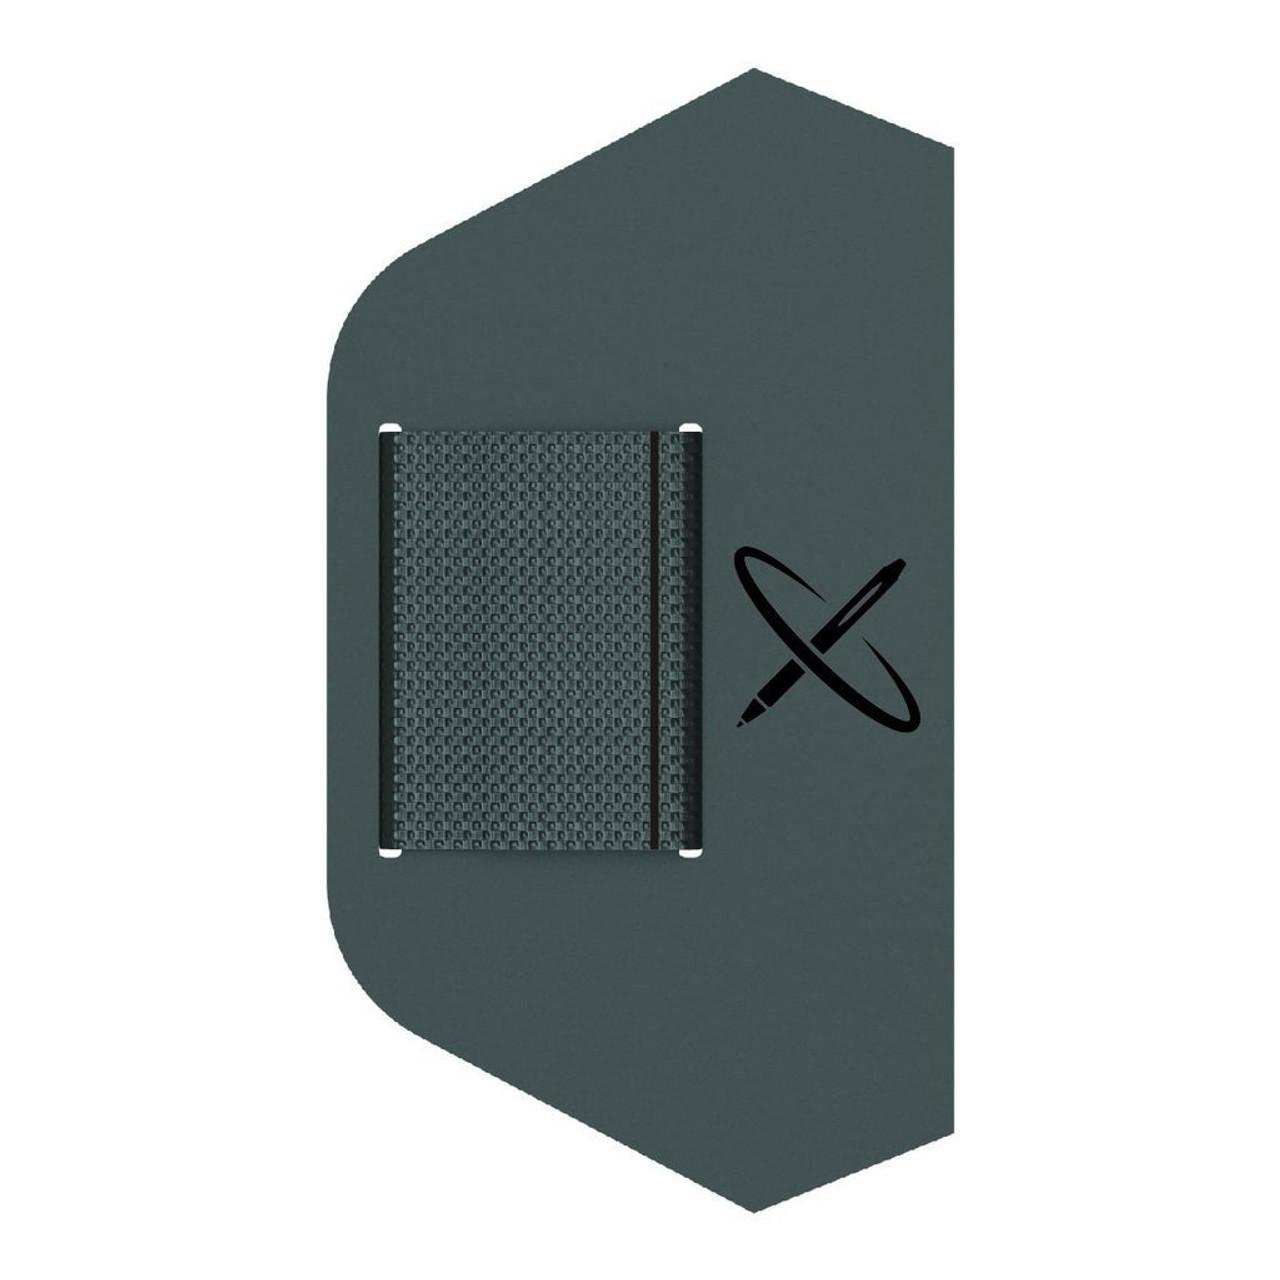 Rocketbook EverLast Reusable Wirebound Notebook- Executive size - Smart Erasable,  with PenStation